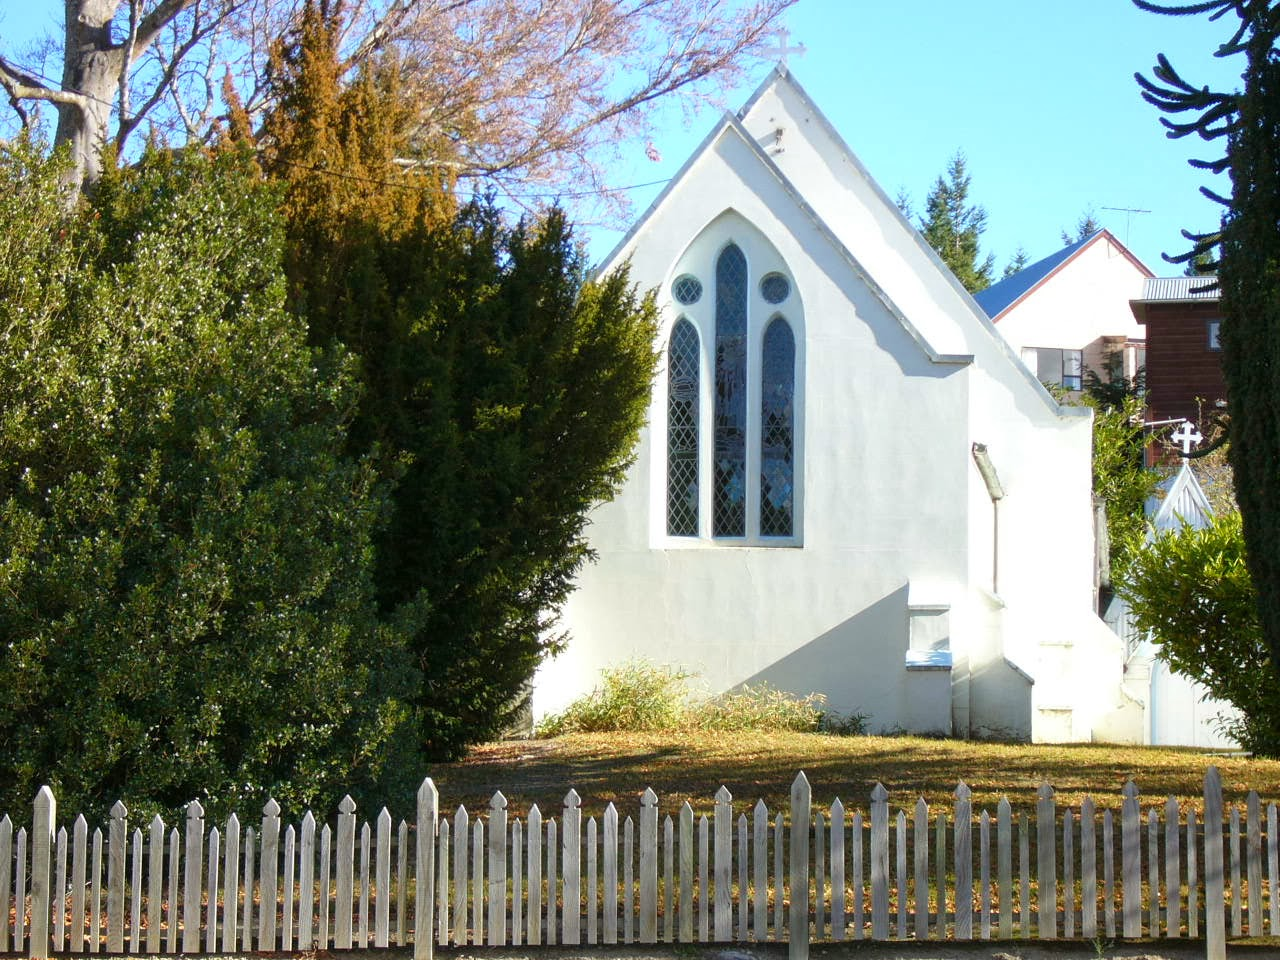 Photo: St George's Church (Anglican) on Derwent Street